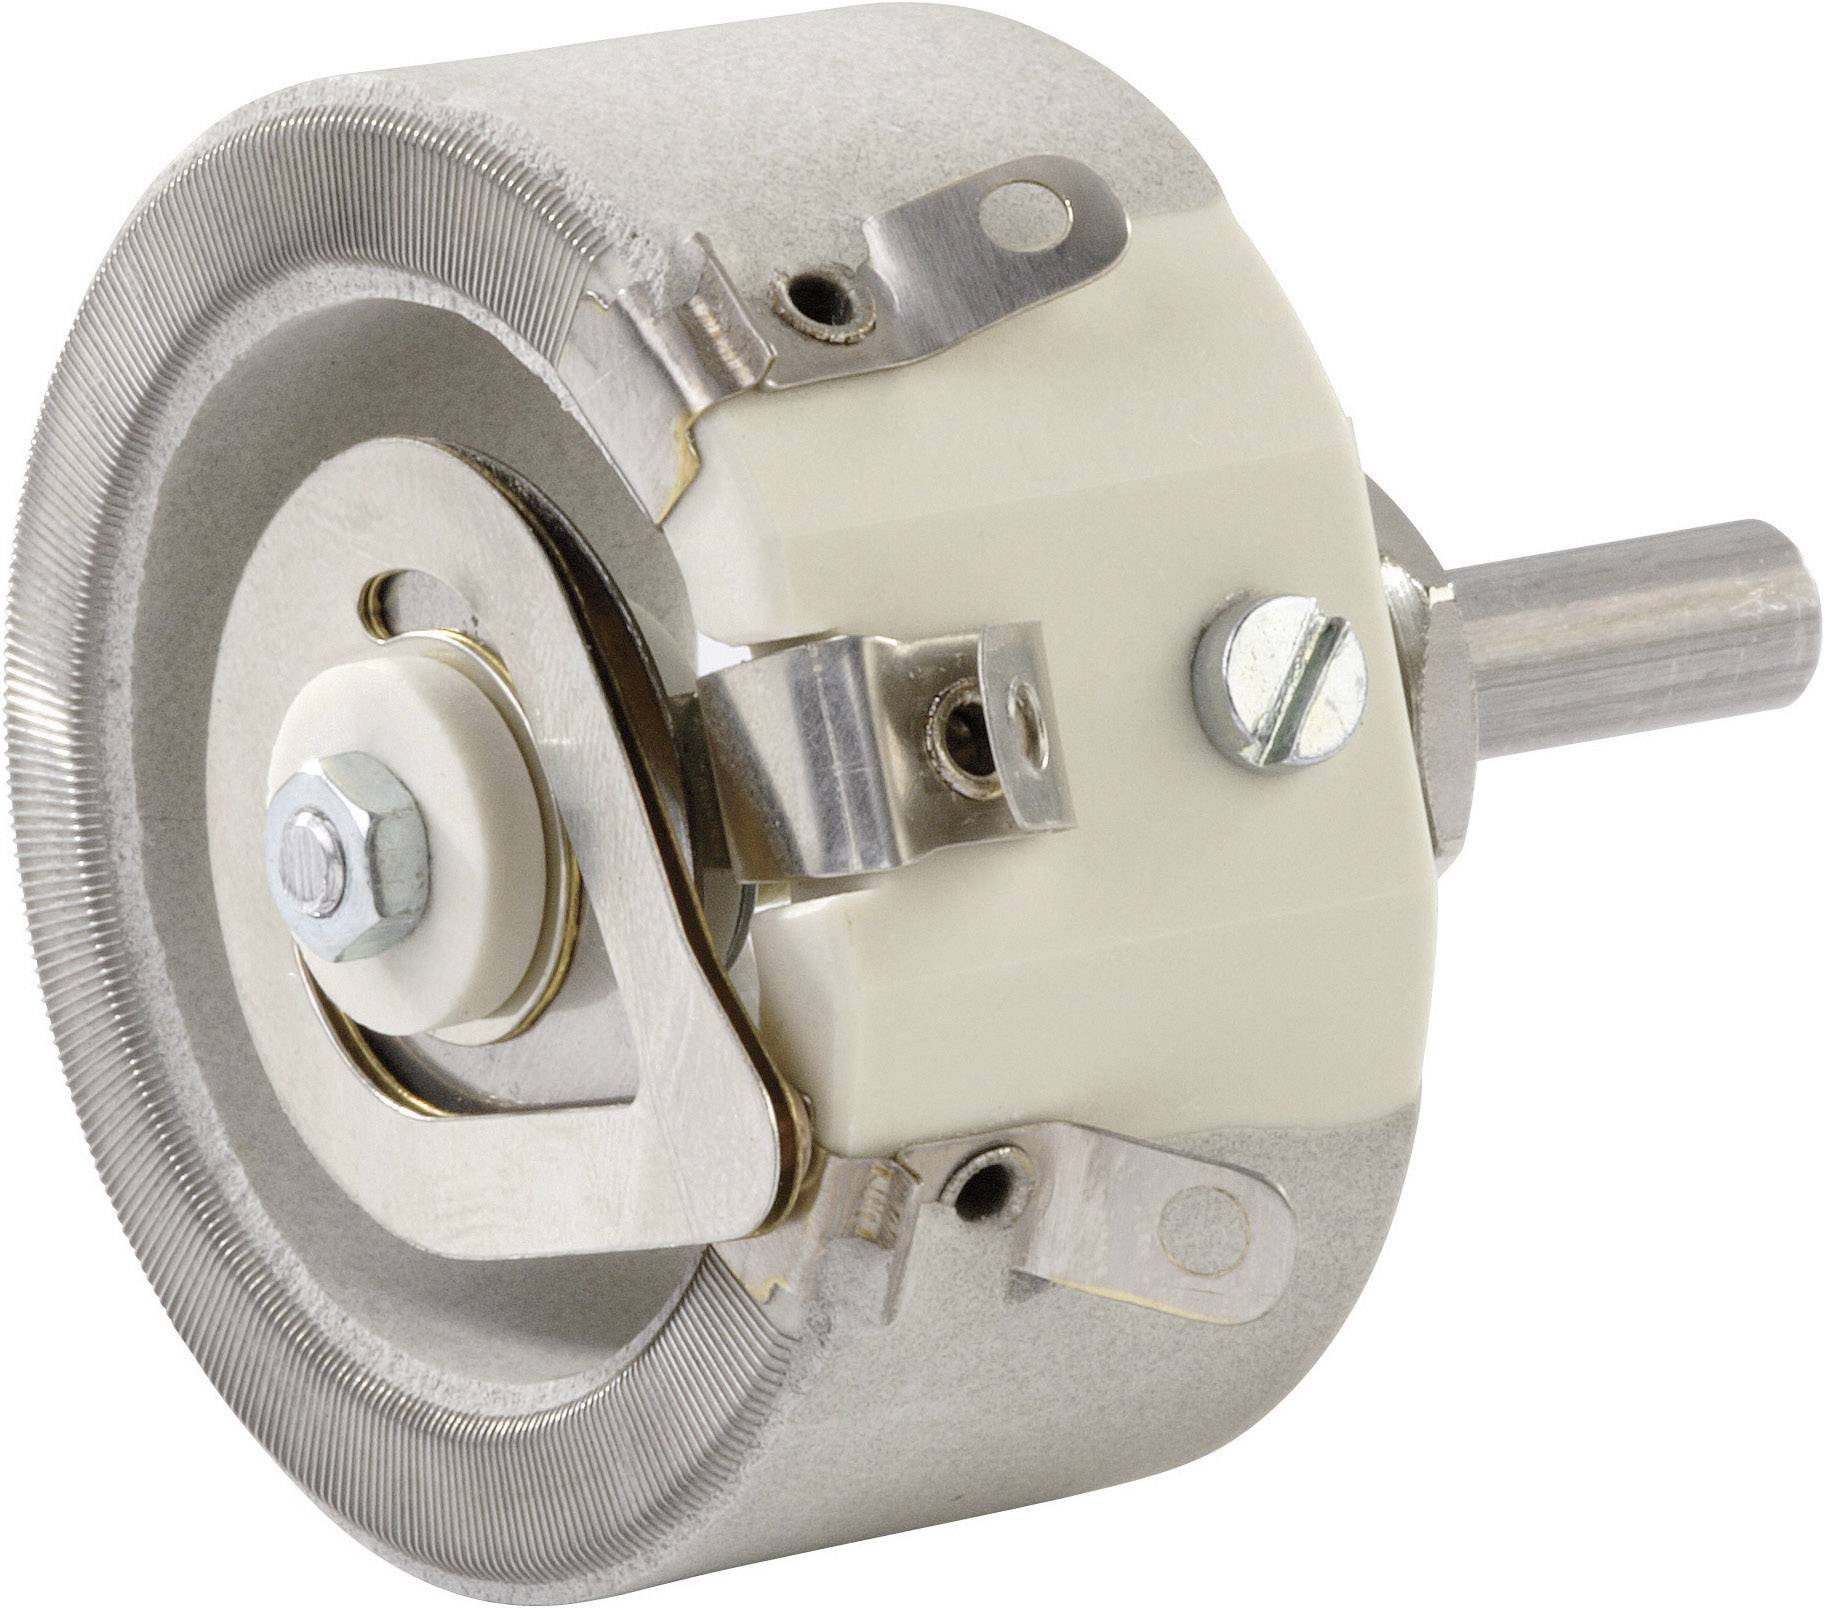 Drôtový potenciometer mono TT Electronics AB 3191106600 3191106600, 30 W, 100 Ohm, 1 ks